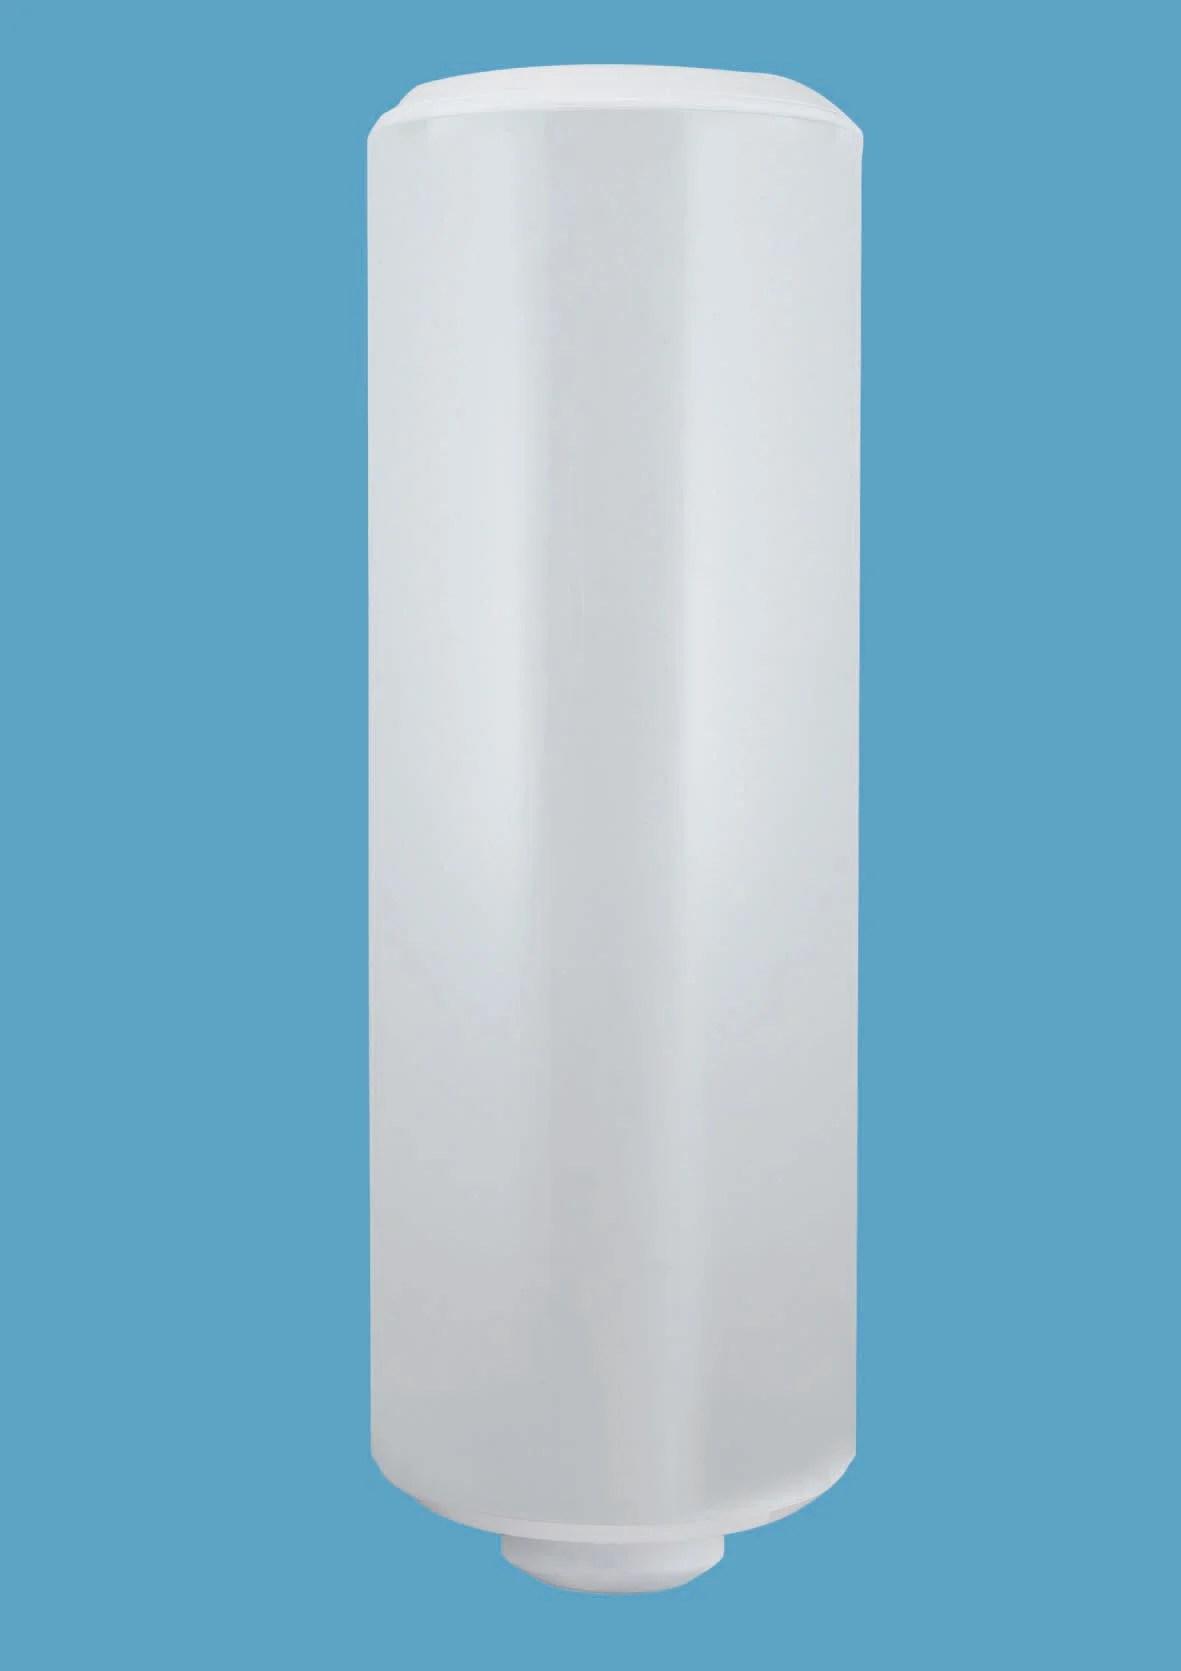 Chauffe Eau Electrique Vertical Mural Steatite 200 L Leroy Merlin